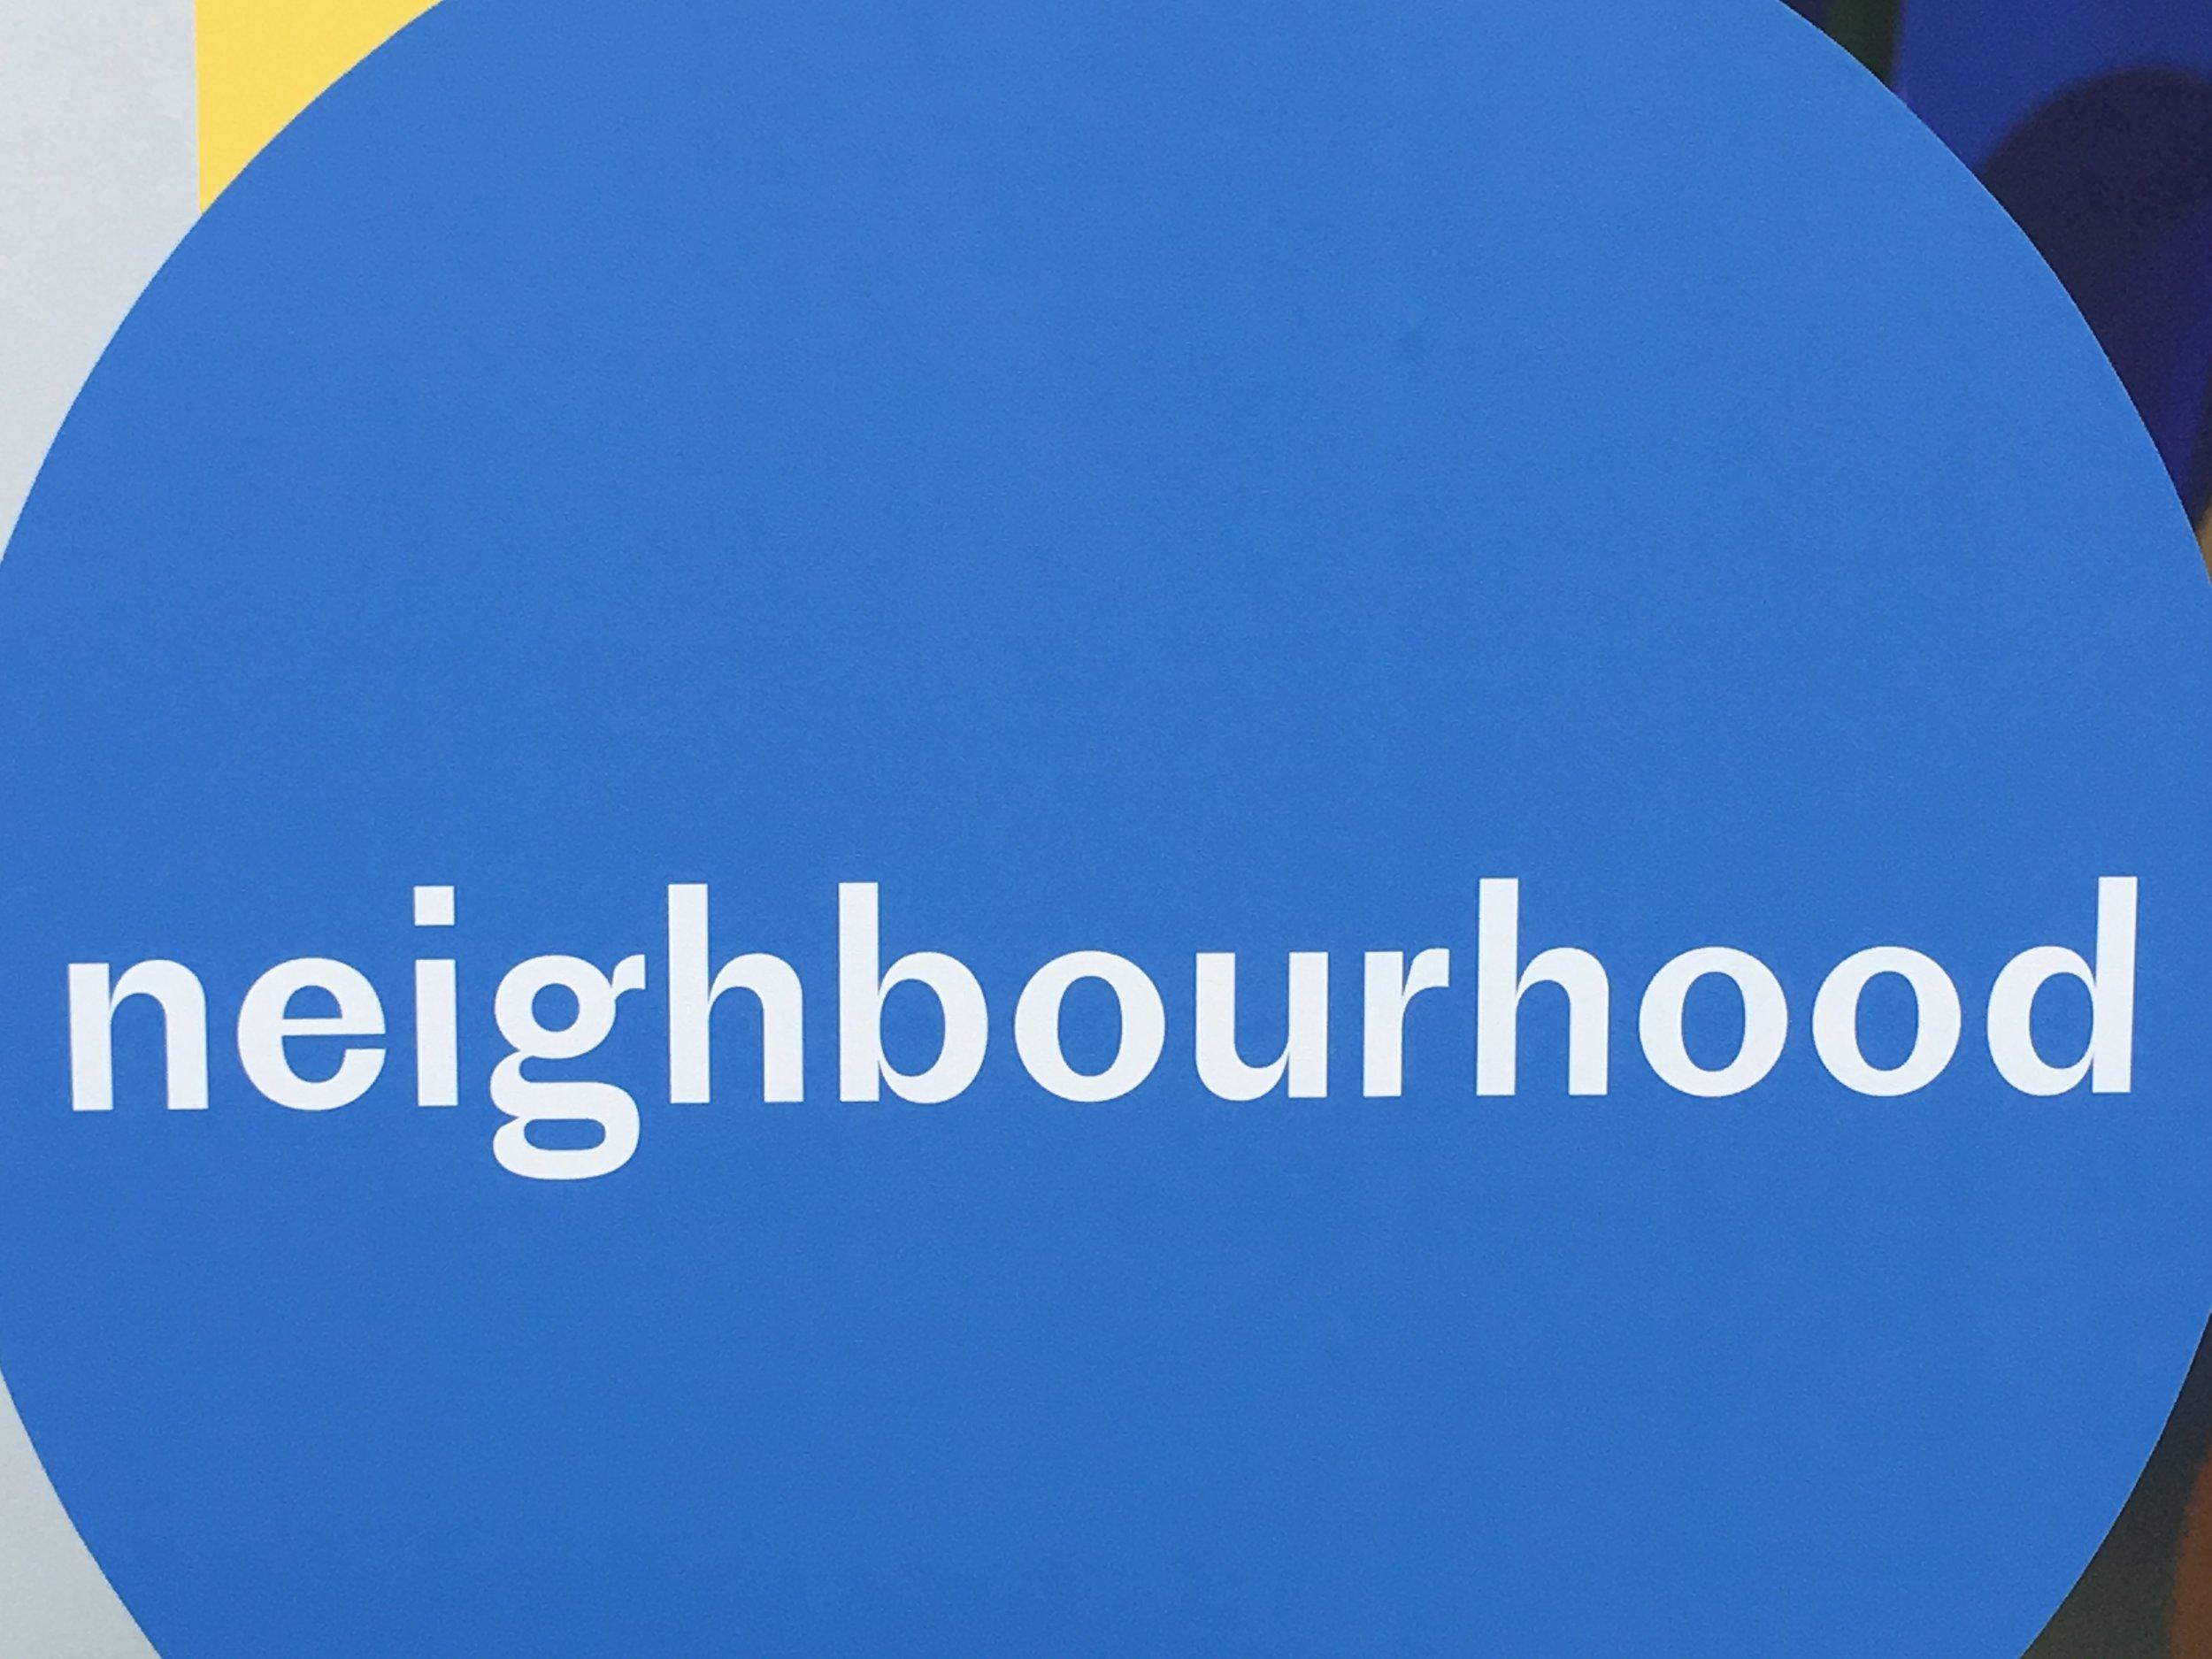 www.livingspaceproject.com/neighbourhoods image